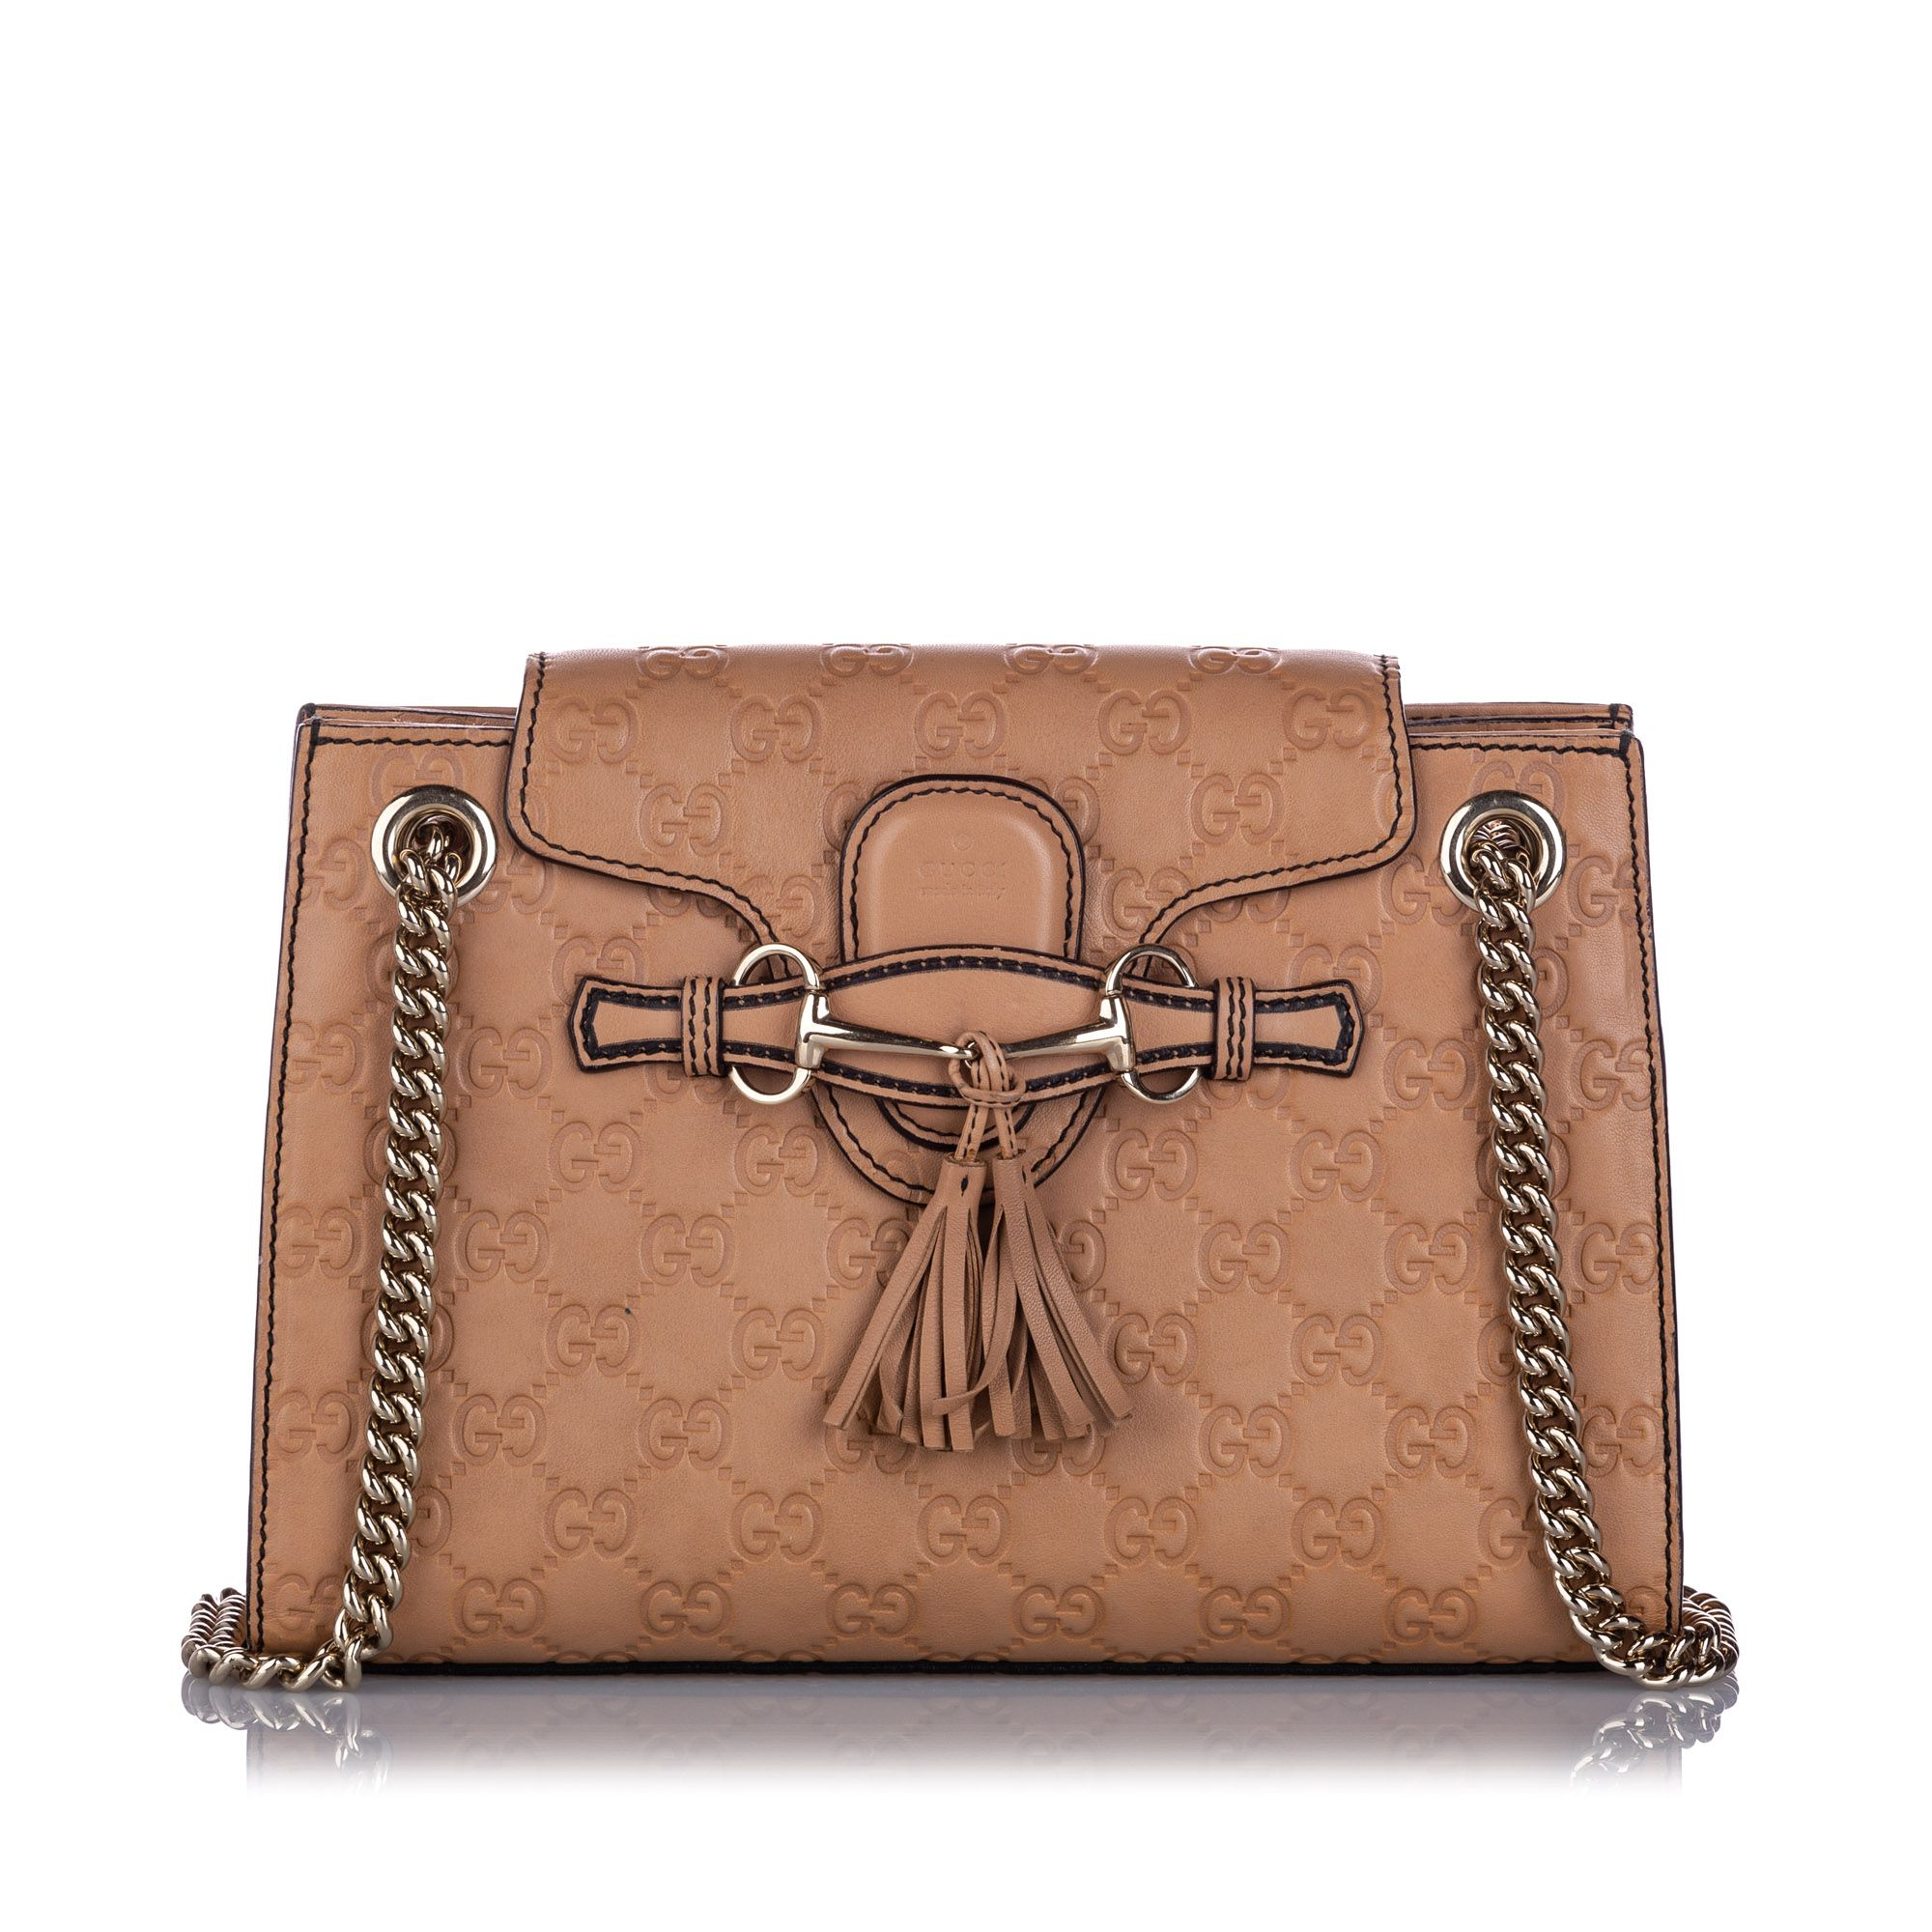 Vintage Gucci Small Guccissima Emily Shoulder Bag Brown